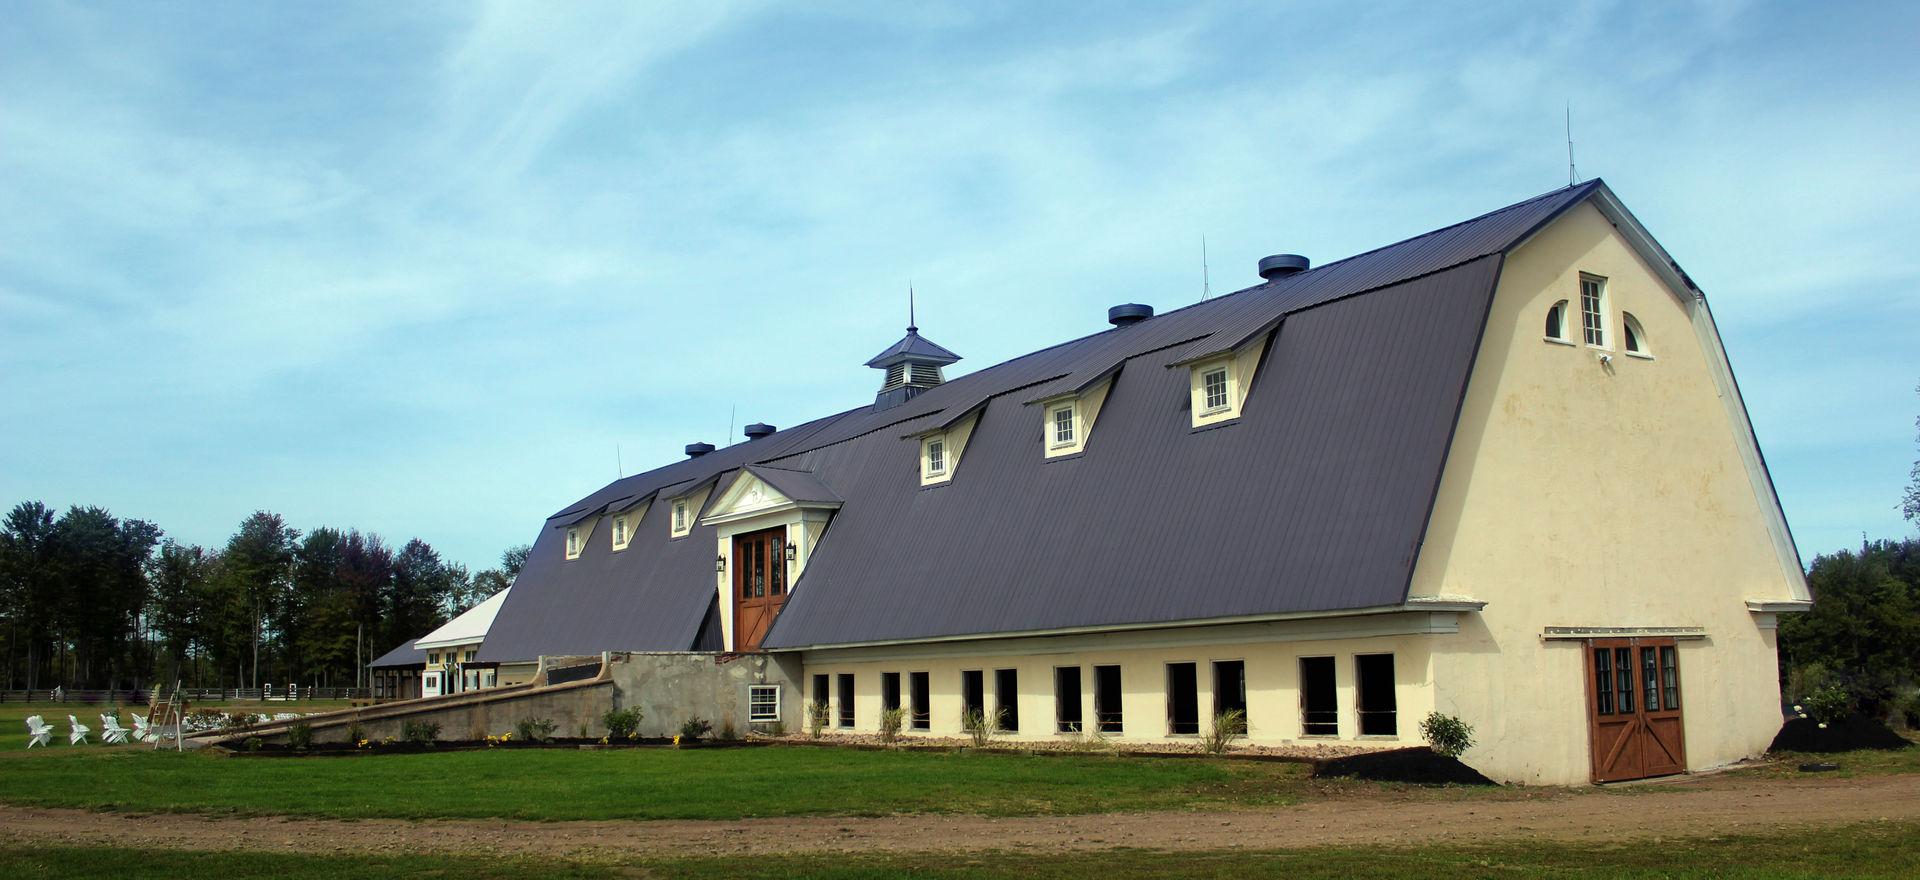 Barn Side View